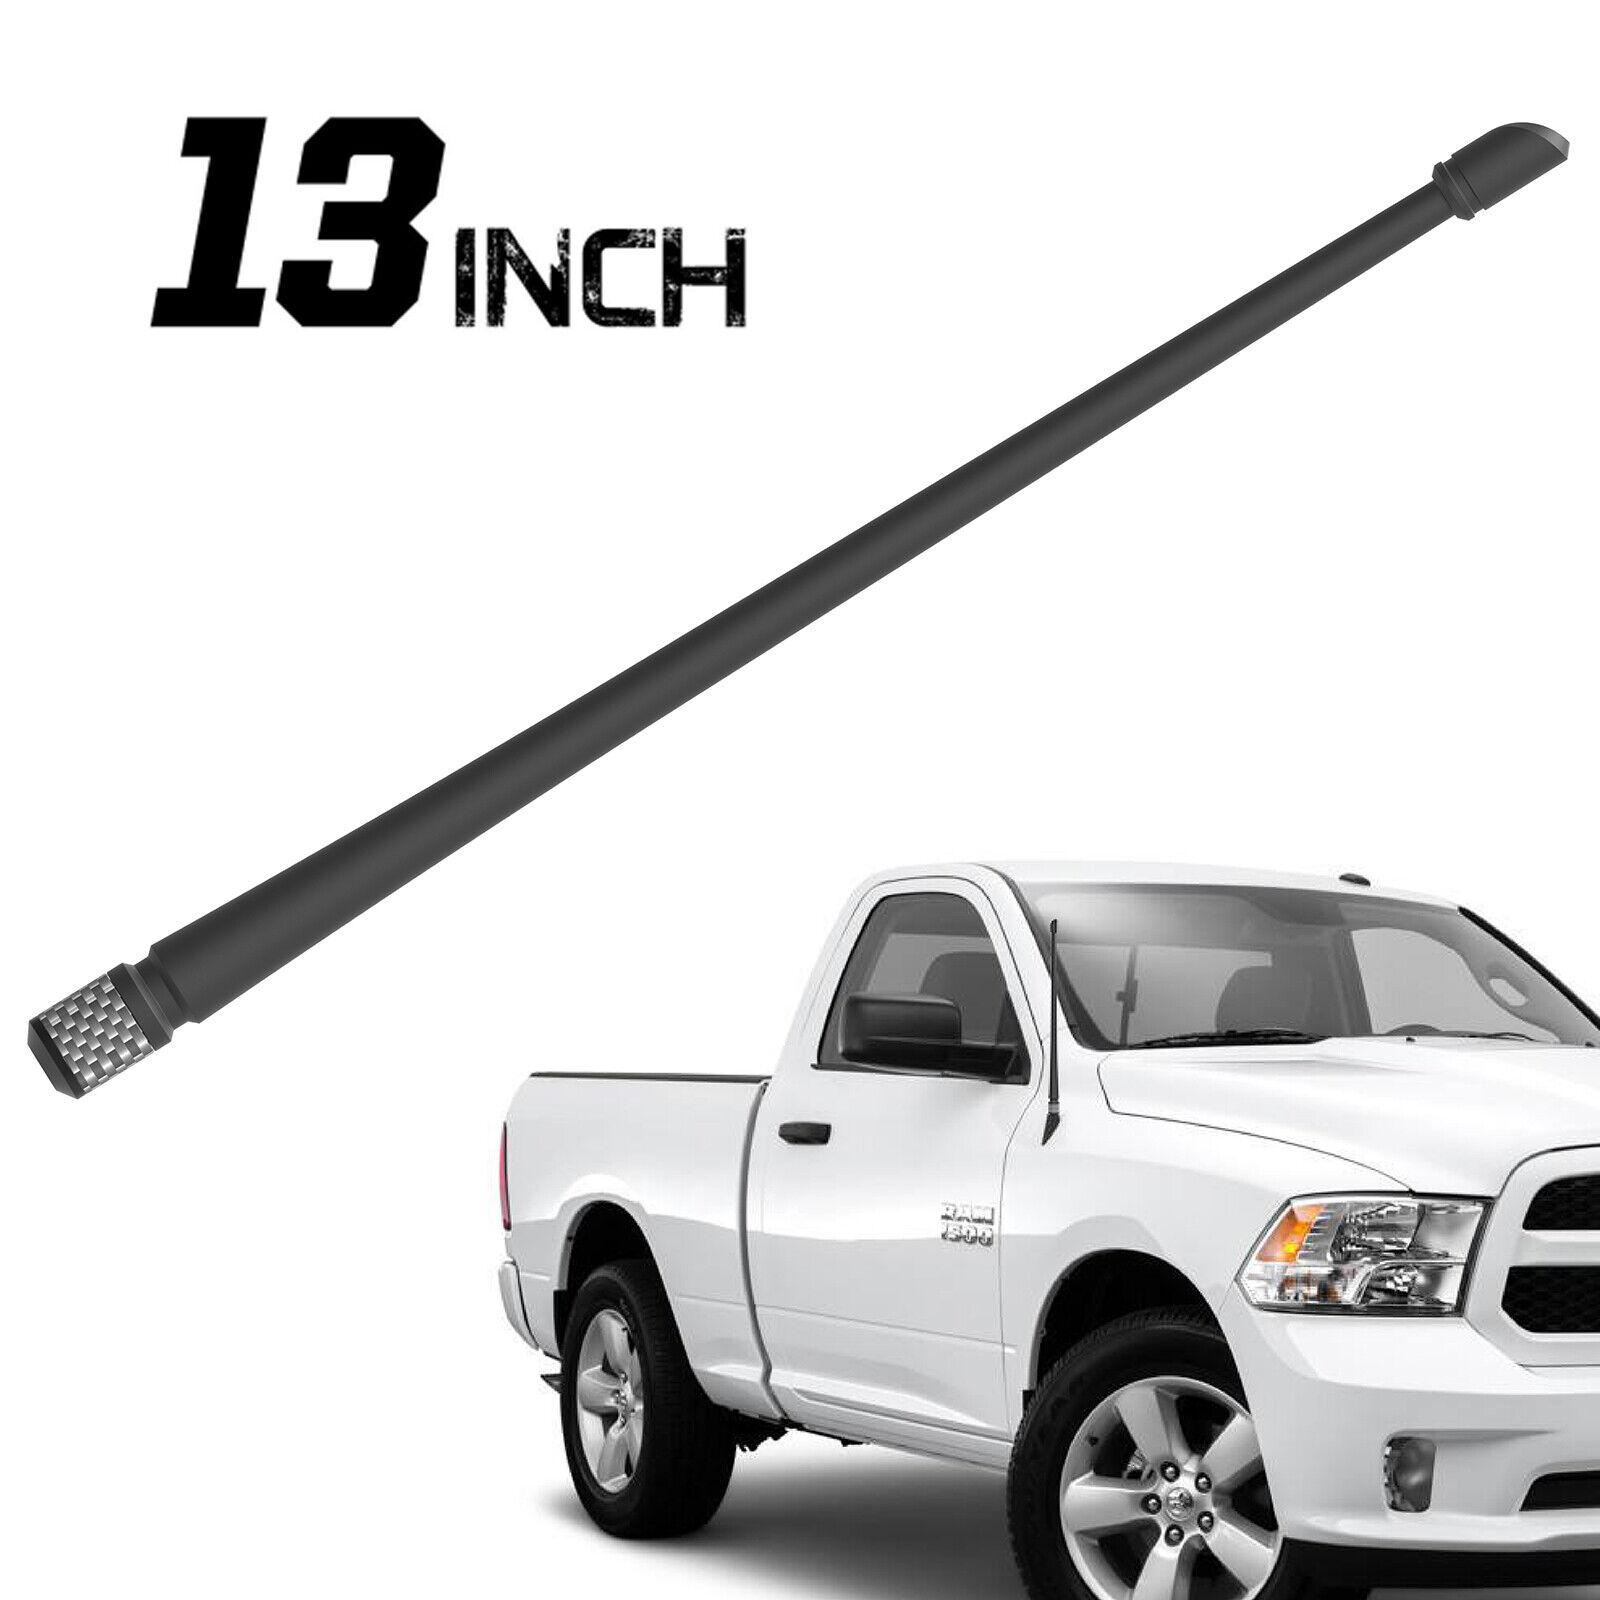 как выглядит Rydonair 13 inches Flexible Antenna Compatible with 2012-2021 Dodge Ram 1500 фото